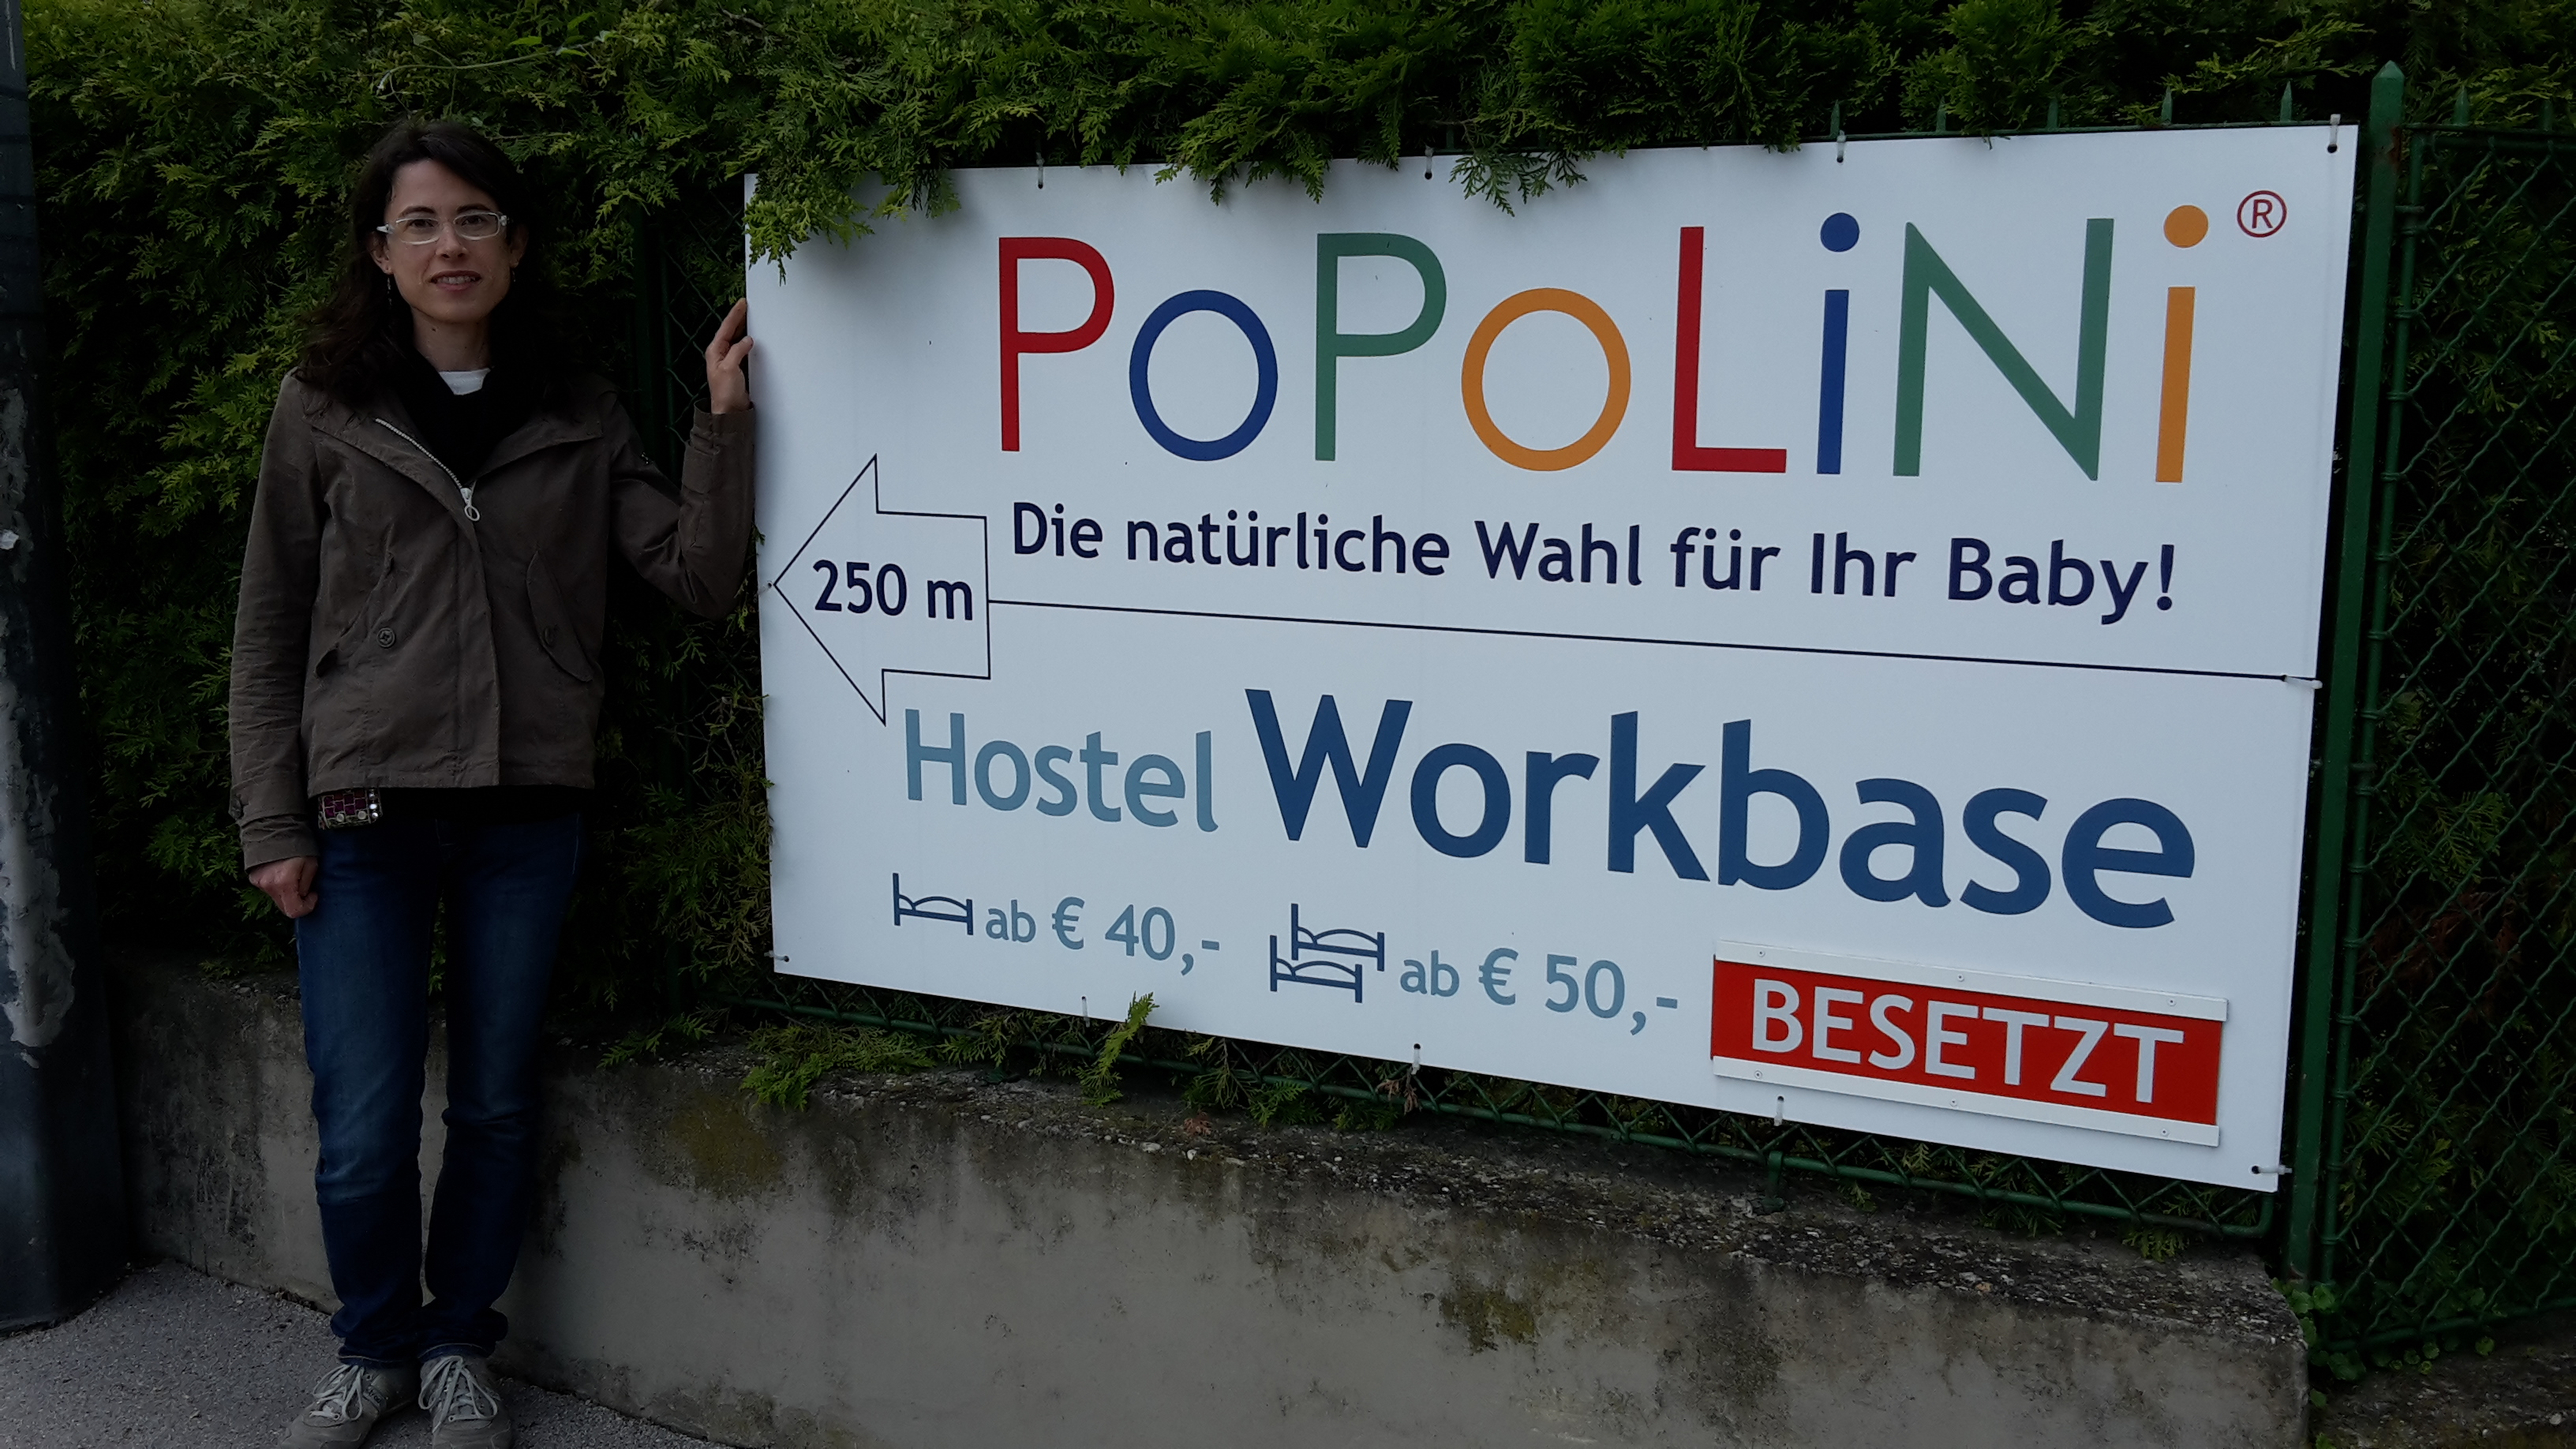 Gita a Vienna da Popolini!